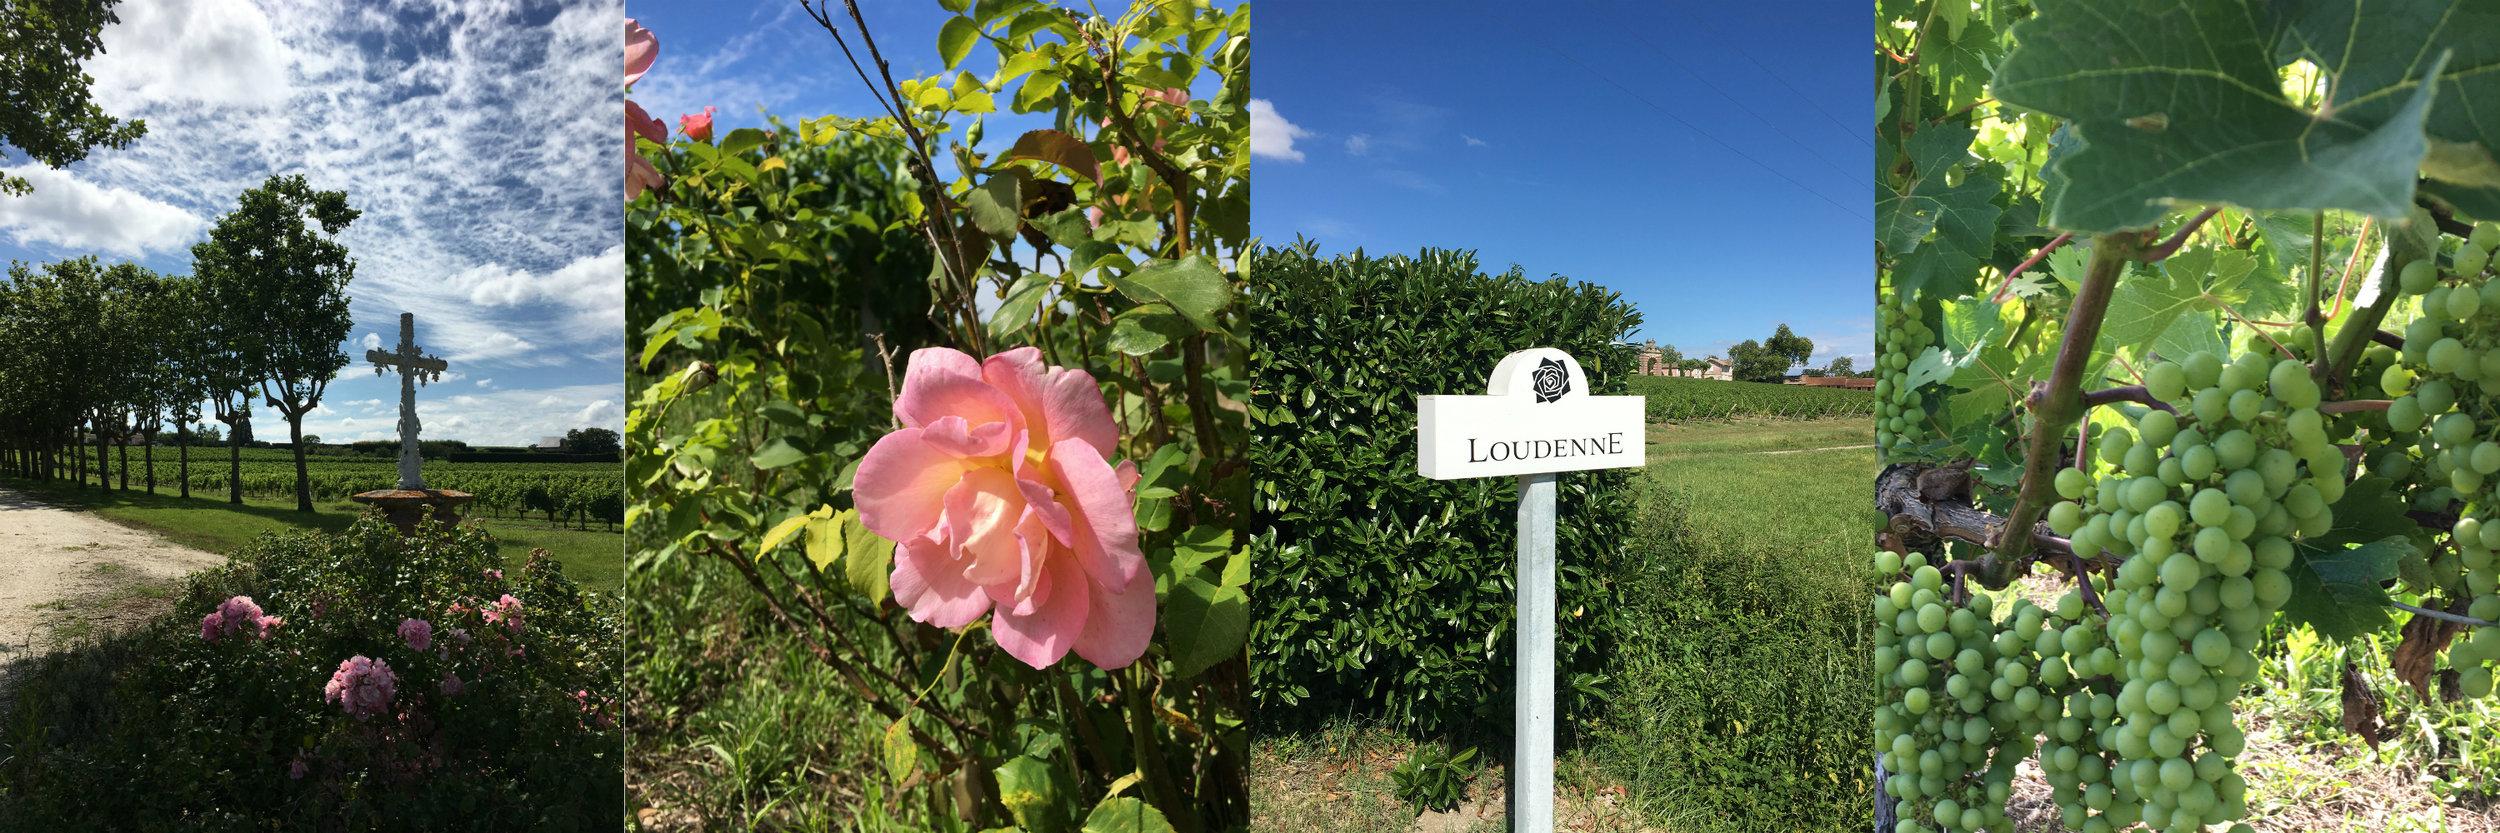 Medoc, France, Wine Vineyard, chateau loudenne